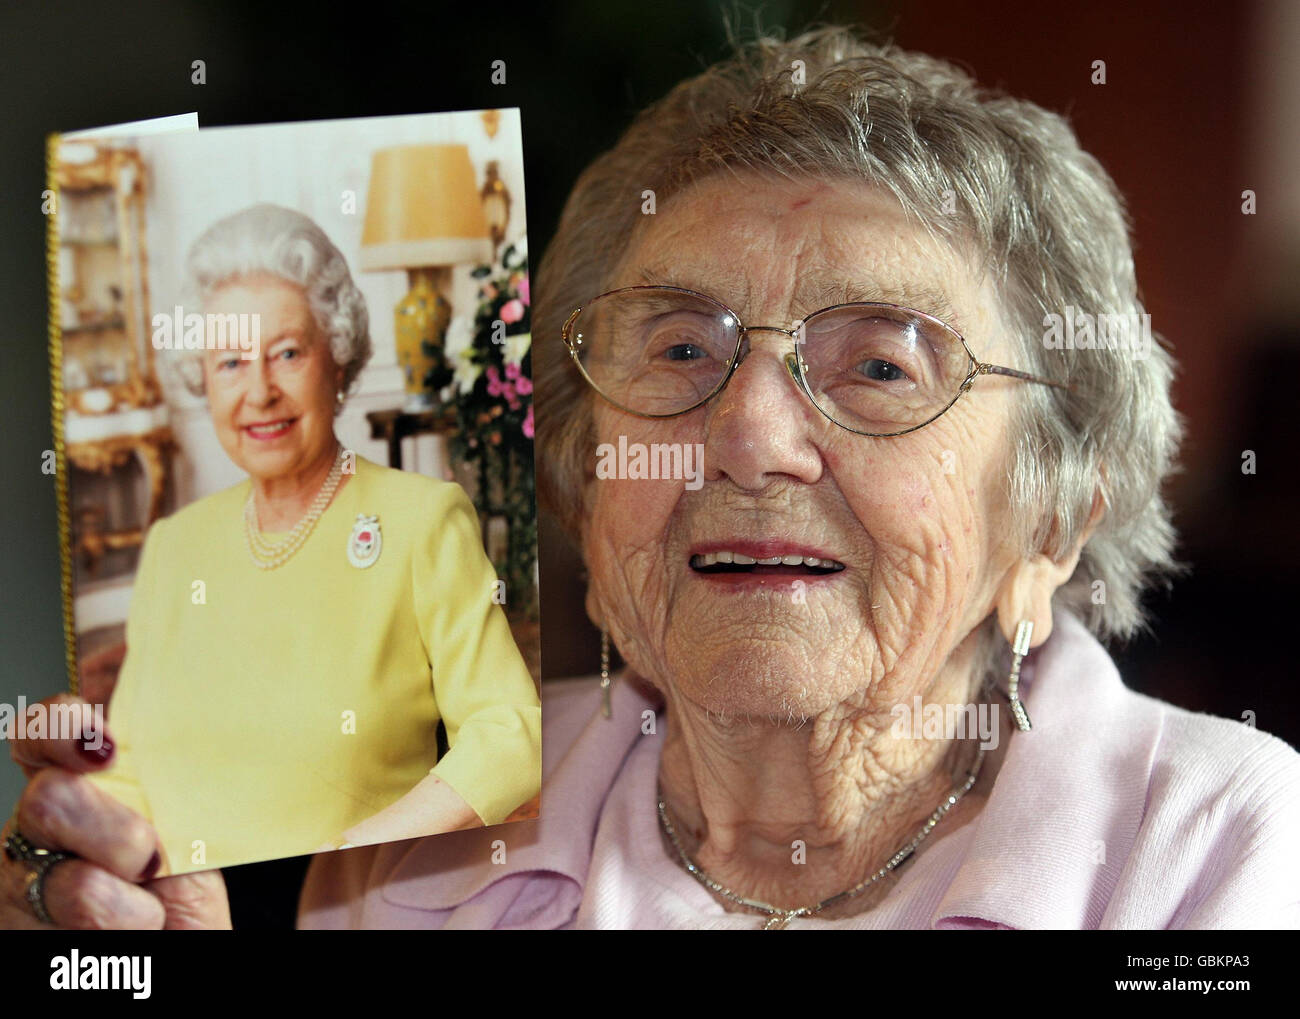 107 Jahre Alte Frau Feiert Geburtstag Stockfoto Bild 110458043 Alamy